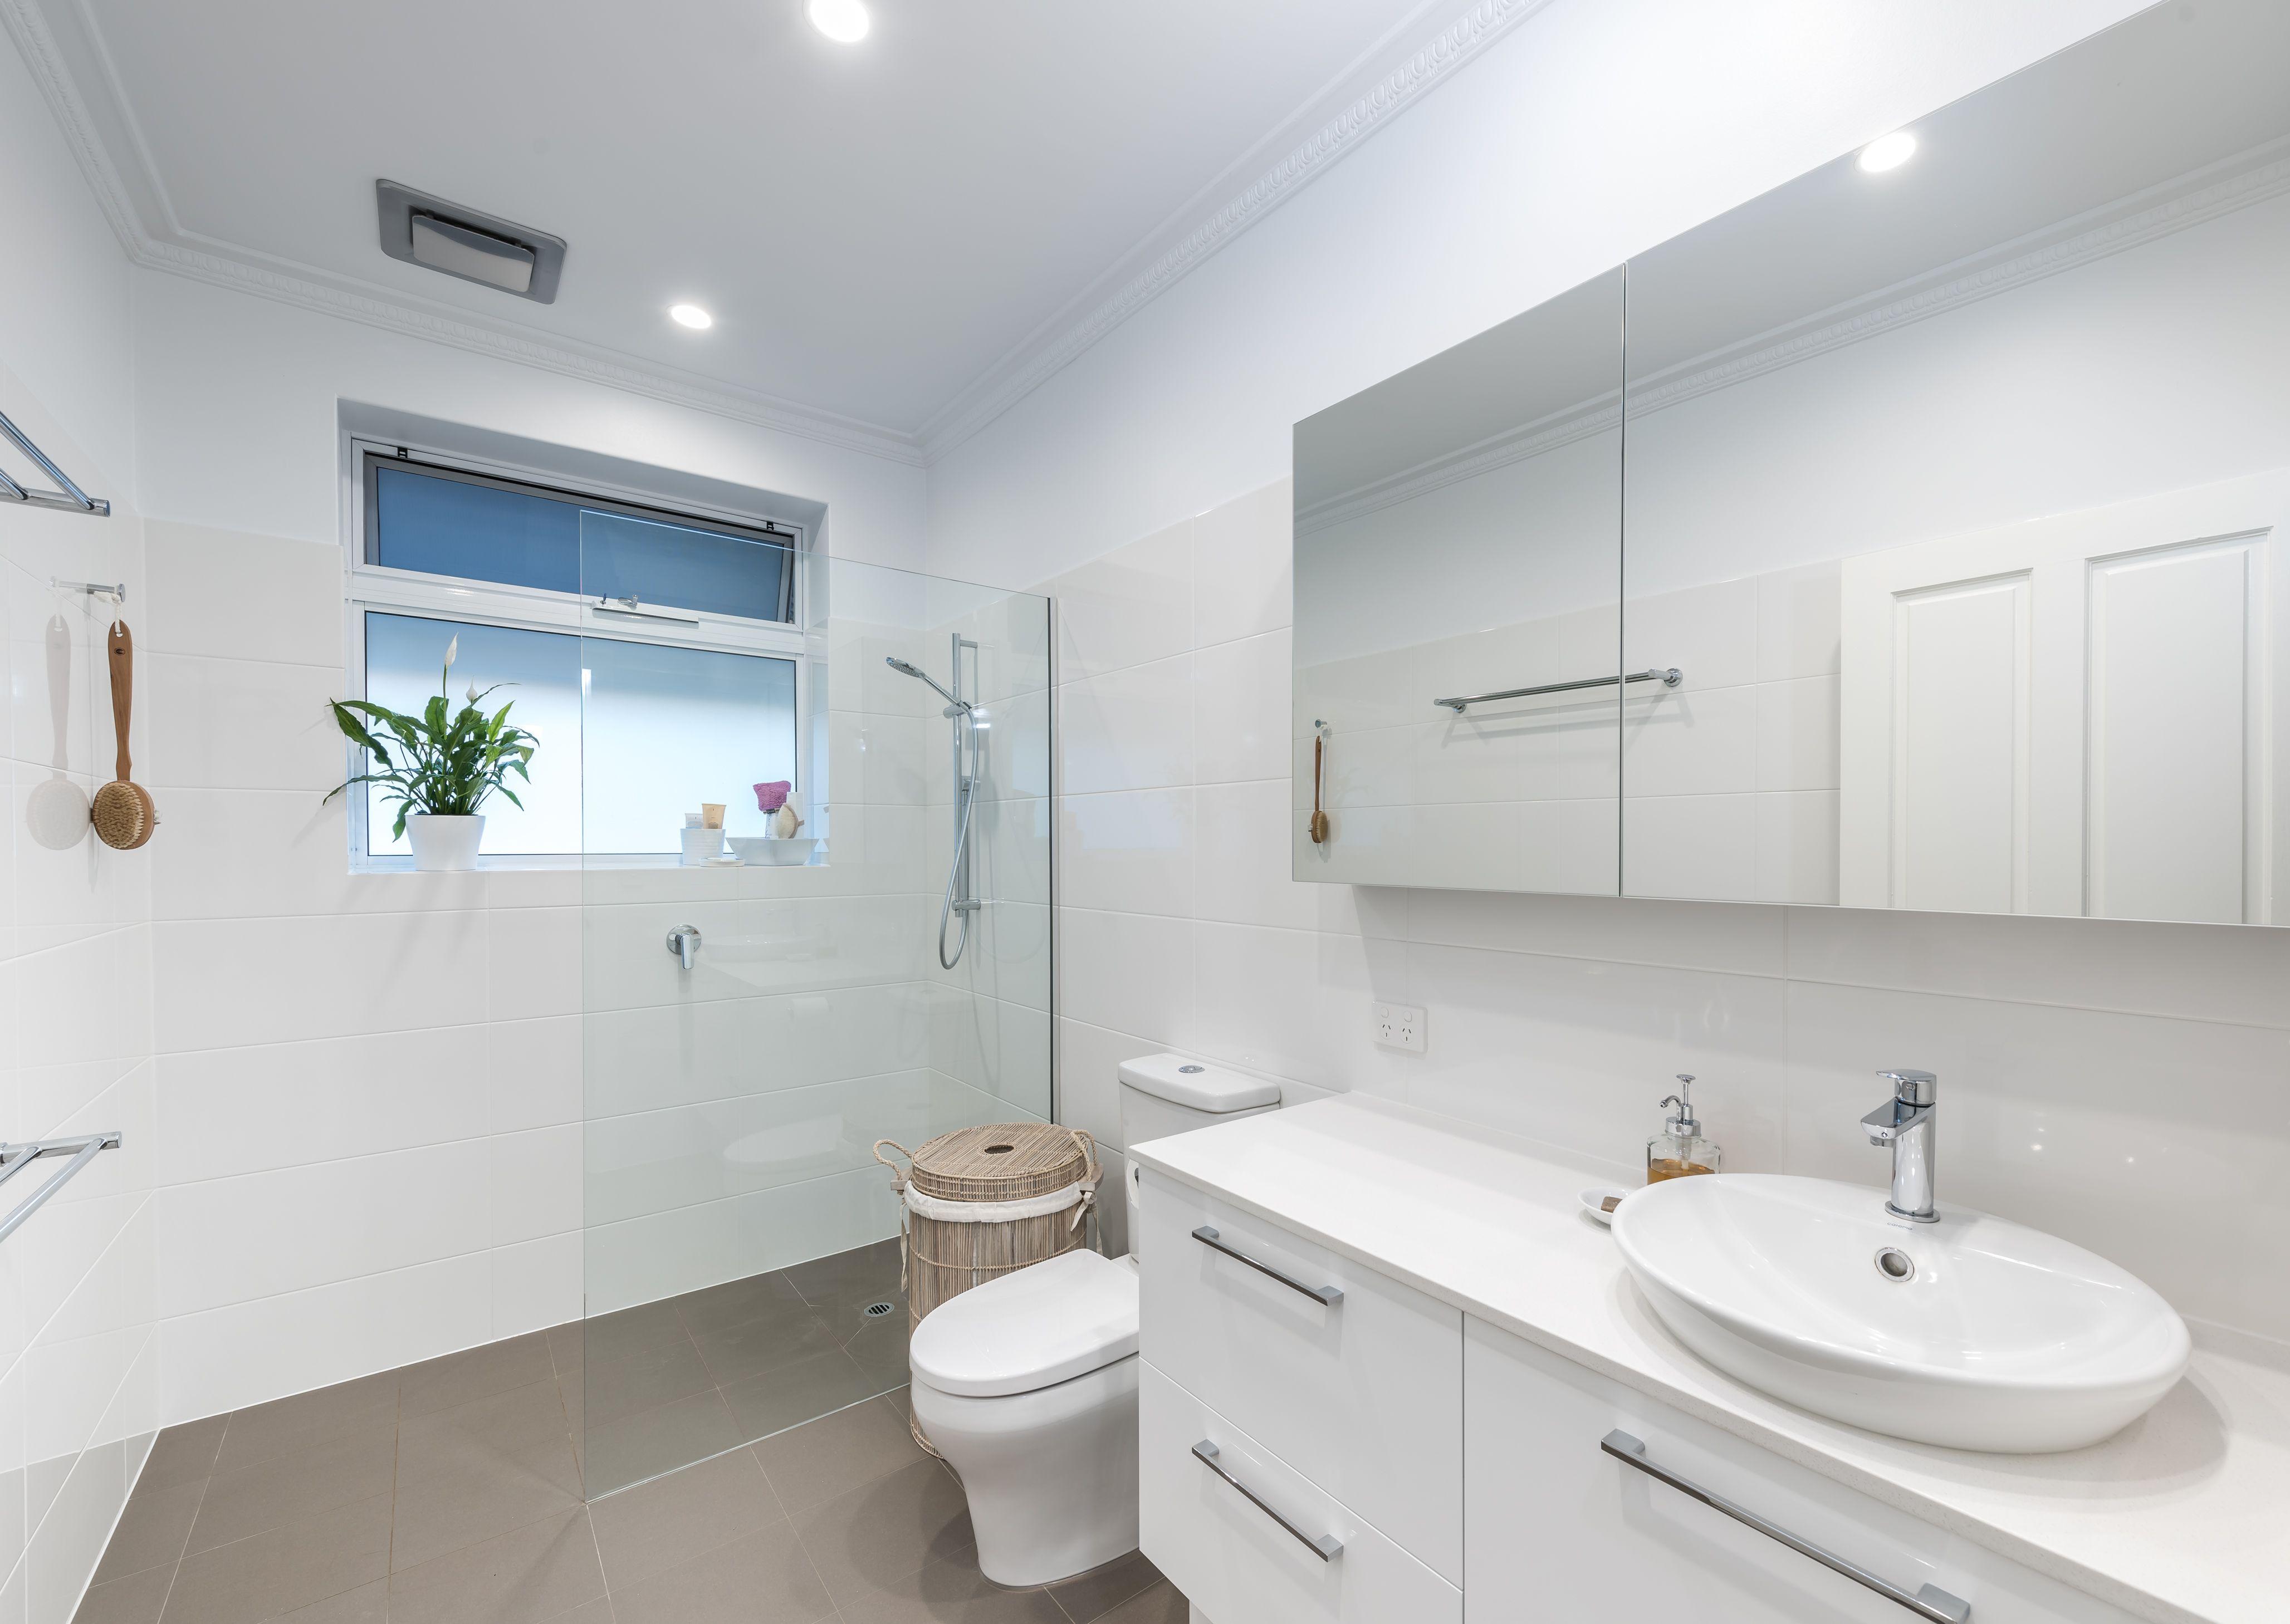 Bathroom Renovations Classy Stylish Bathroom Brilliantsa Bathroom Renovation Classy